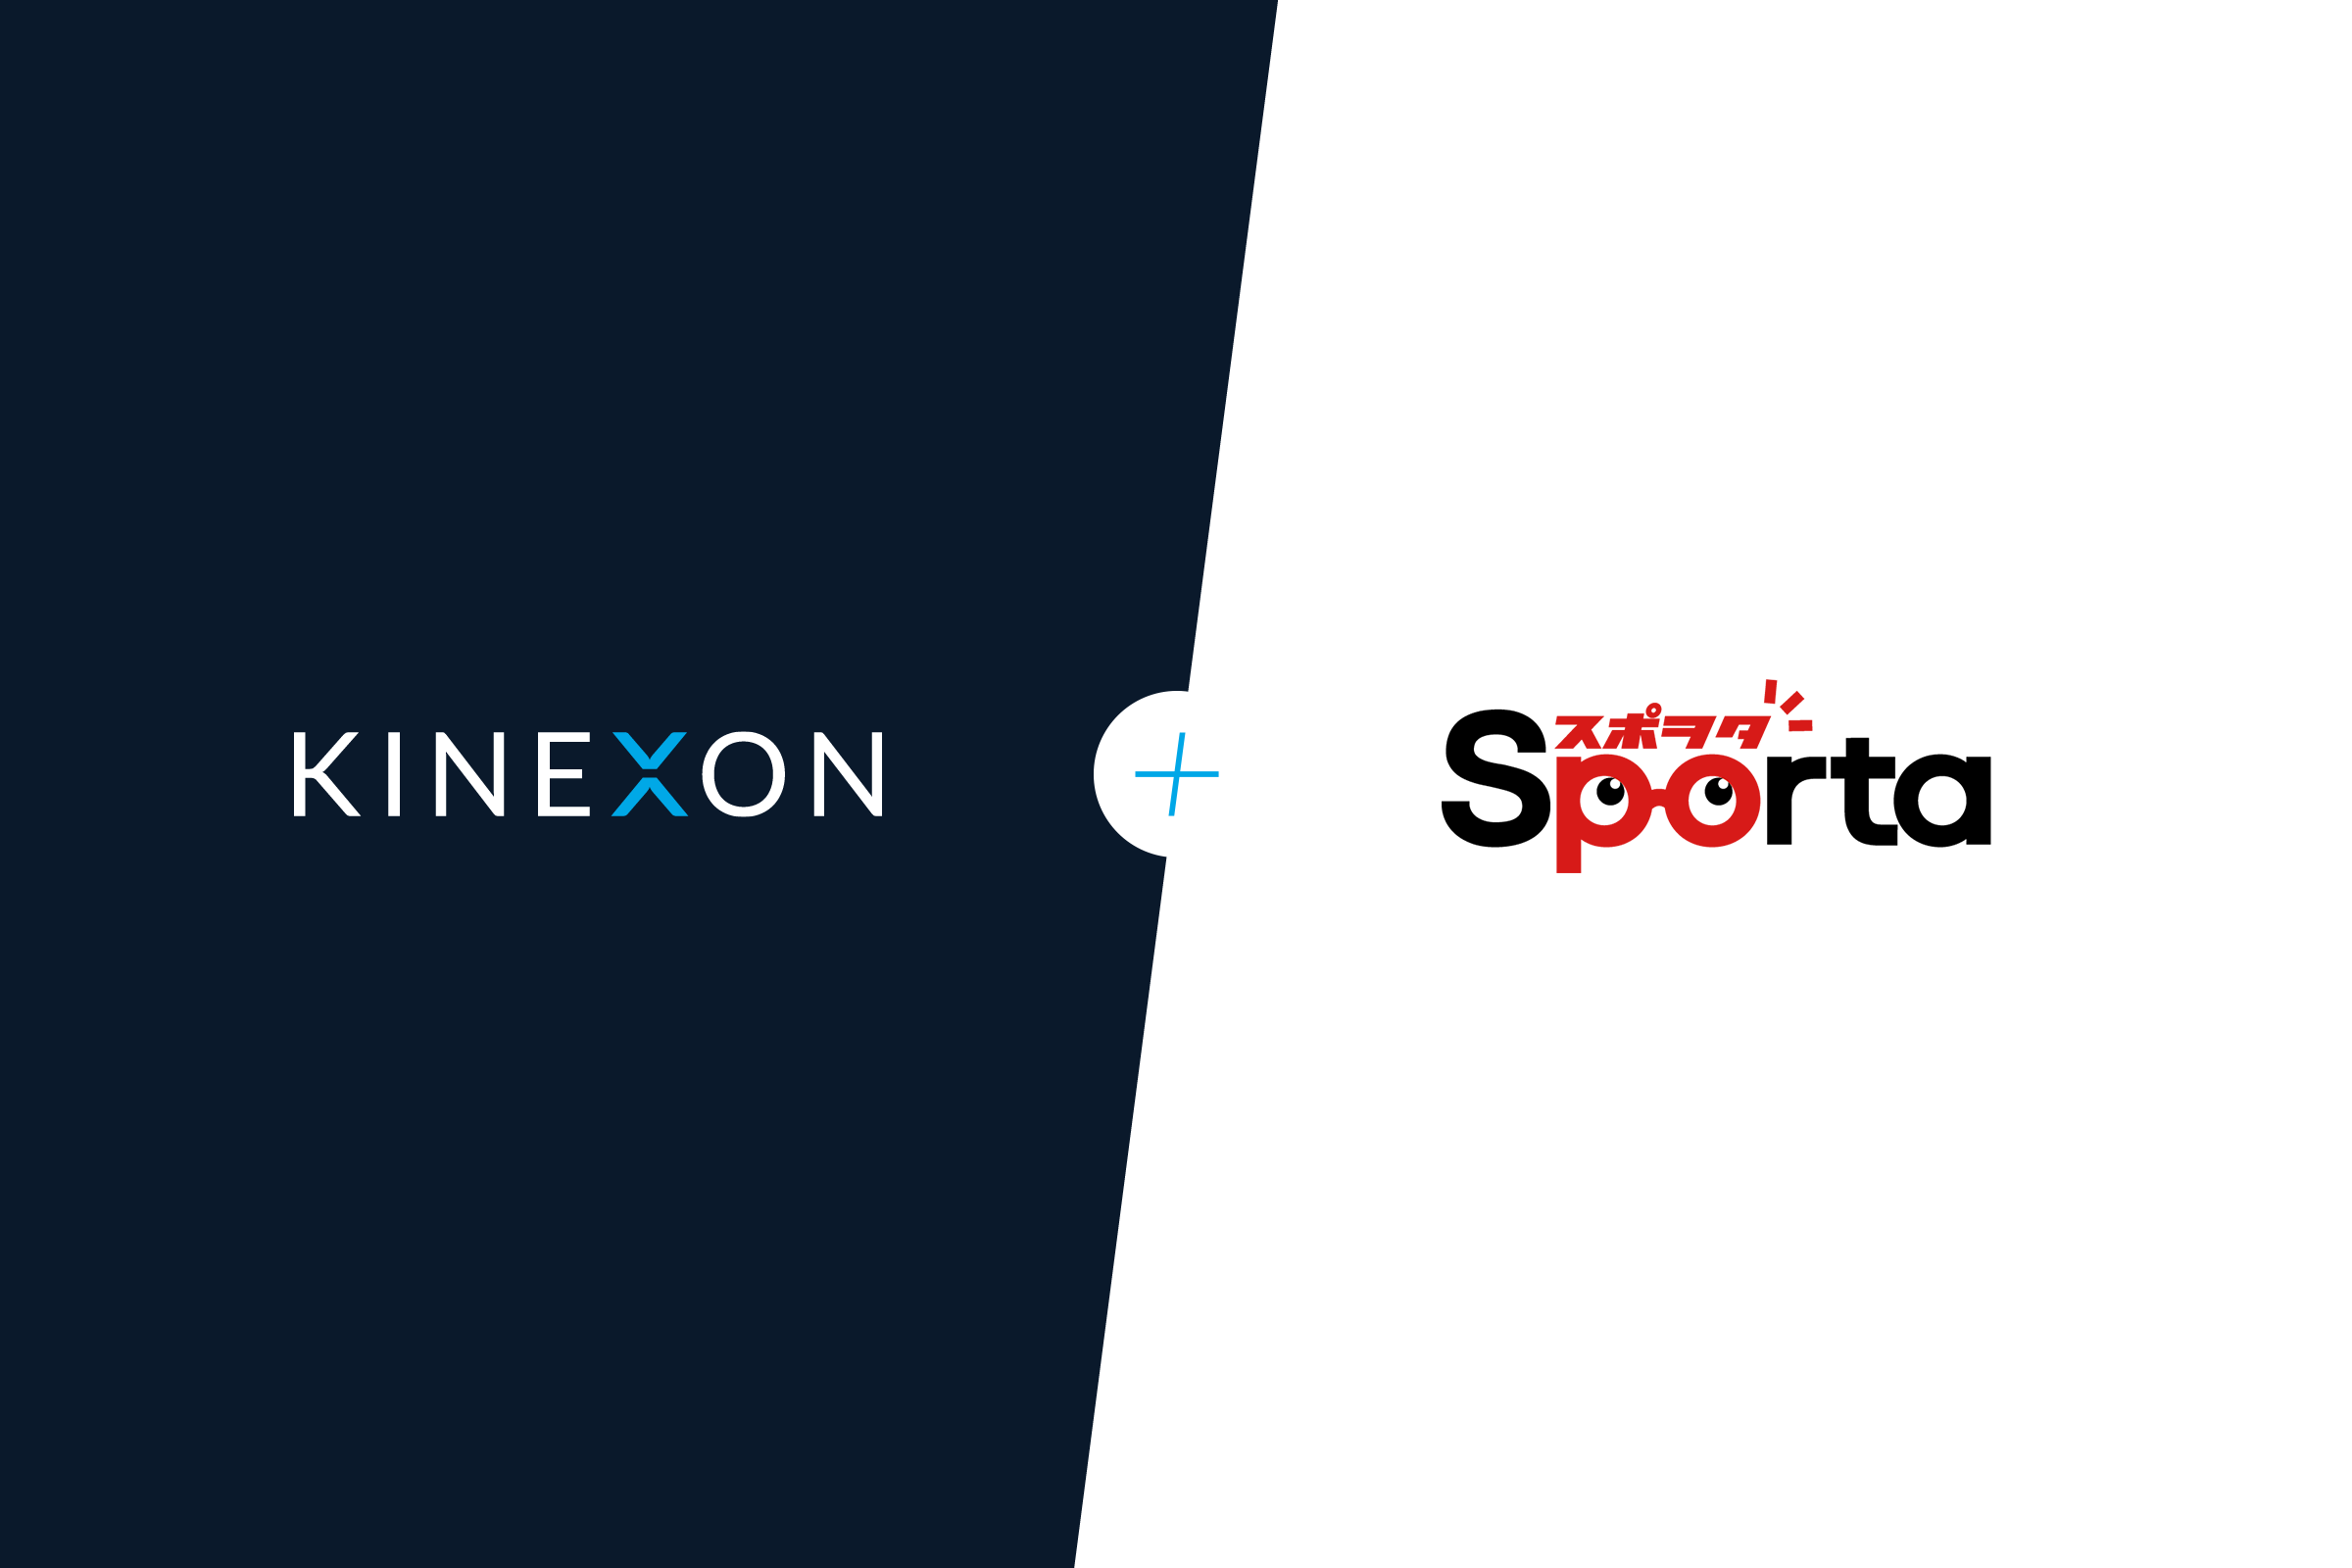 Thumbnail KINEXON Sports Sporta Japan Partnerschaft Website 1